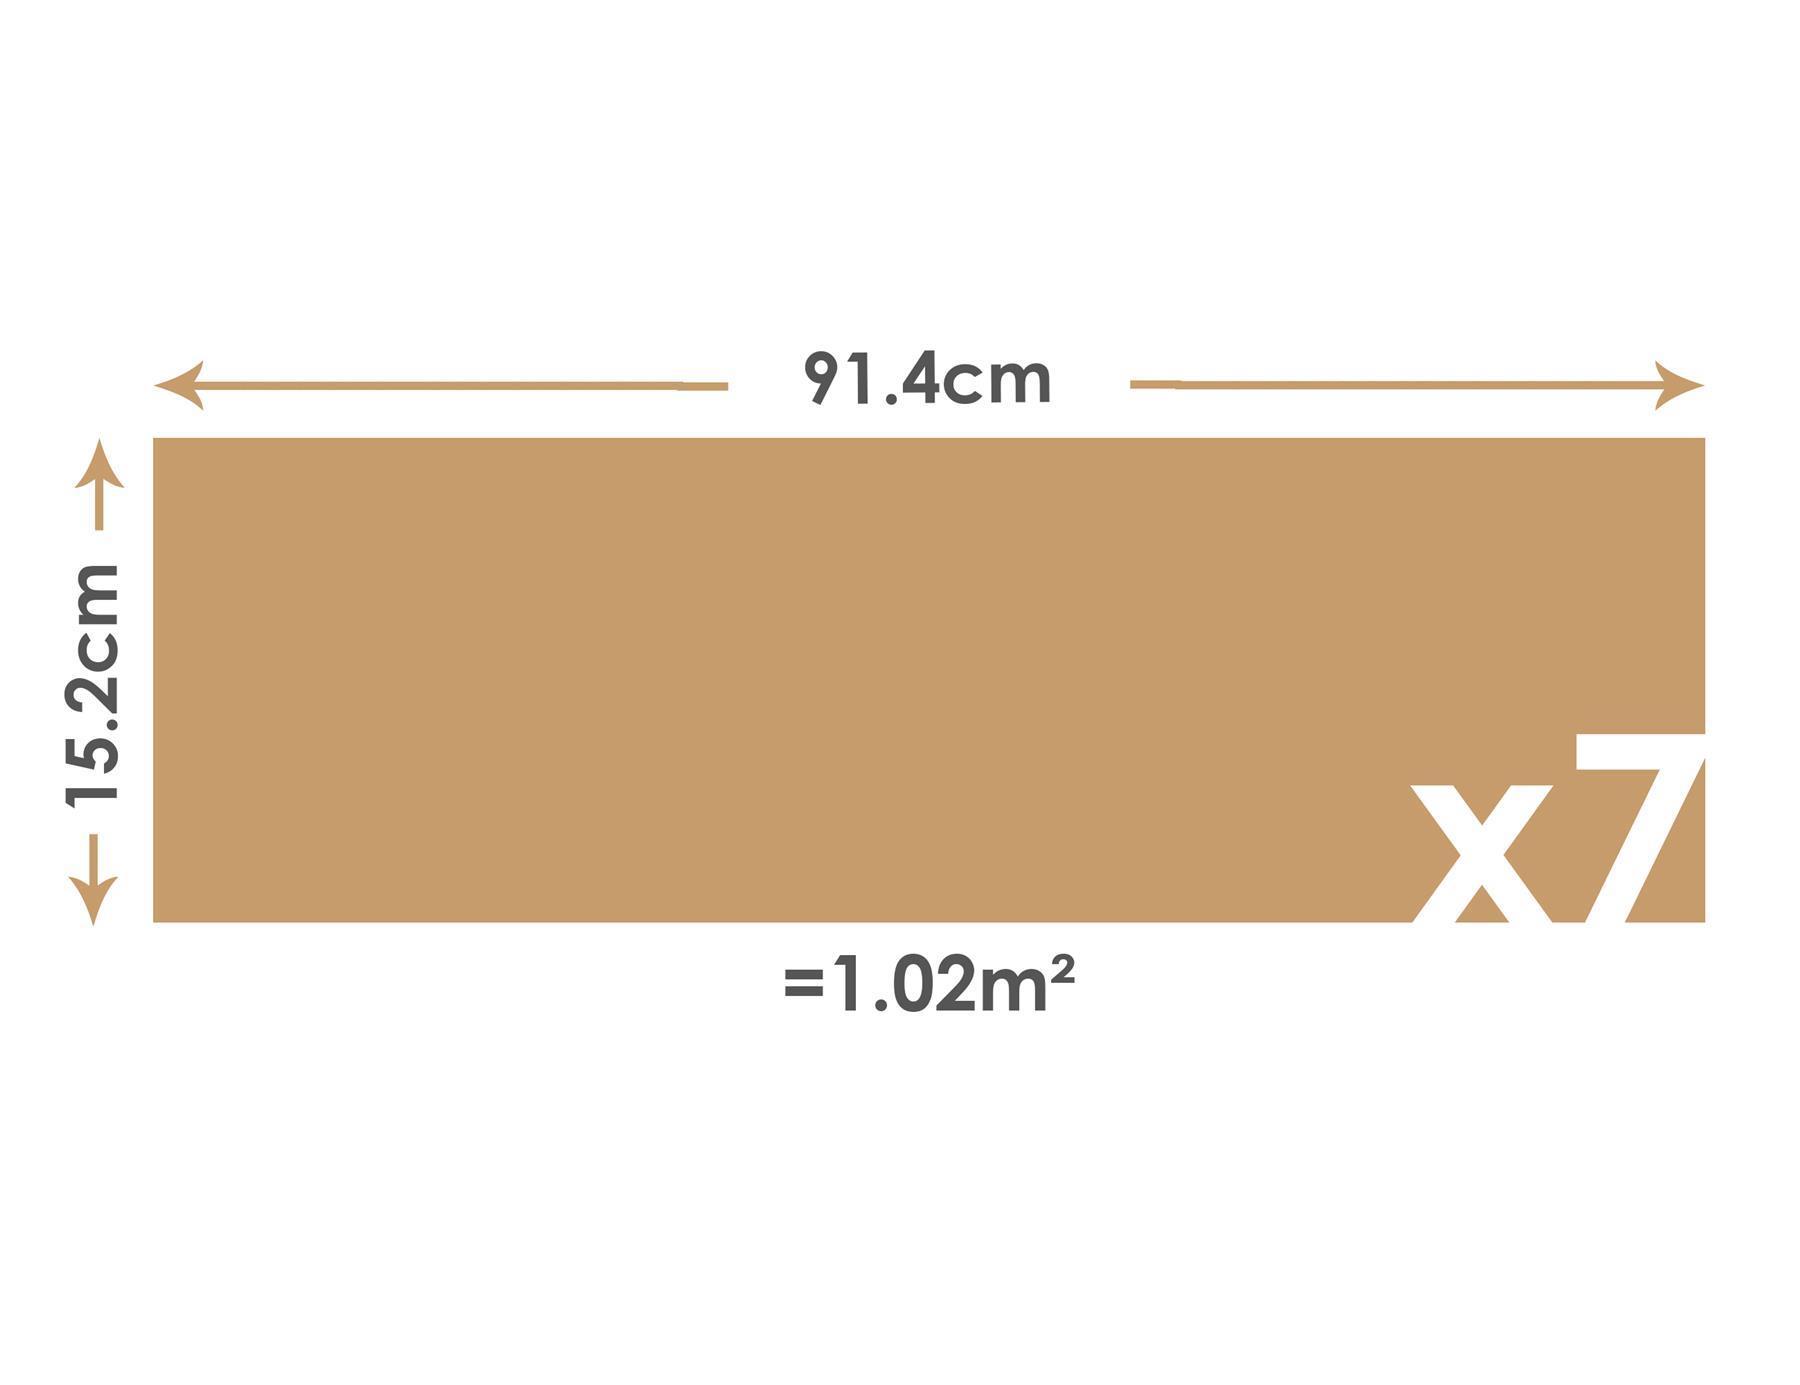 thumbnail 12 - Floor Planks Tiles Self Adhesive Vinyl Brown Wood Flooring Kitchen Bathroom